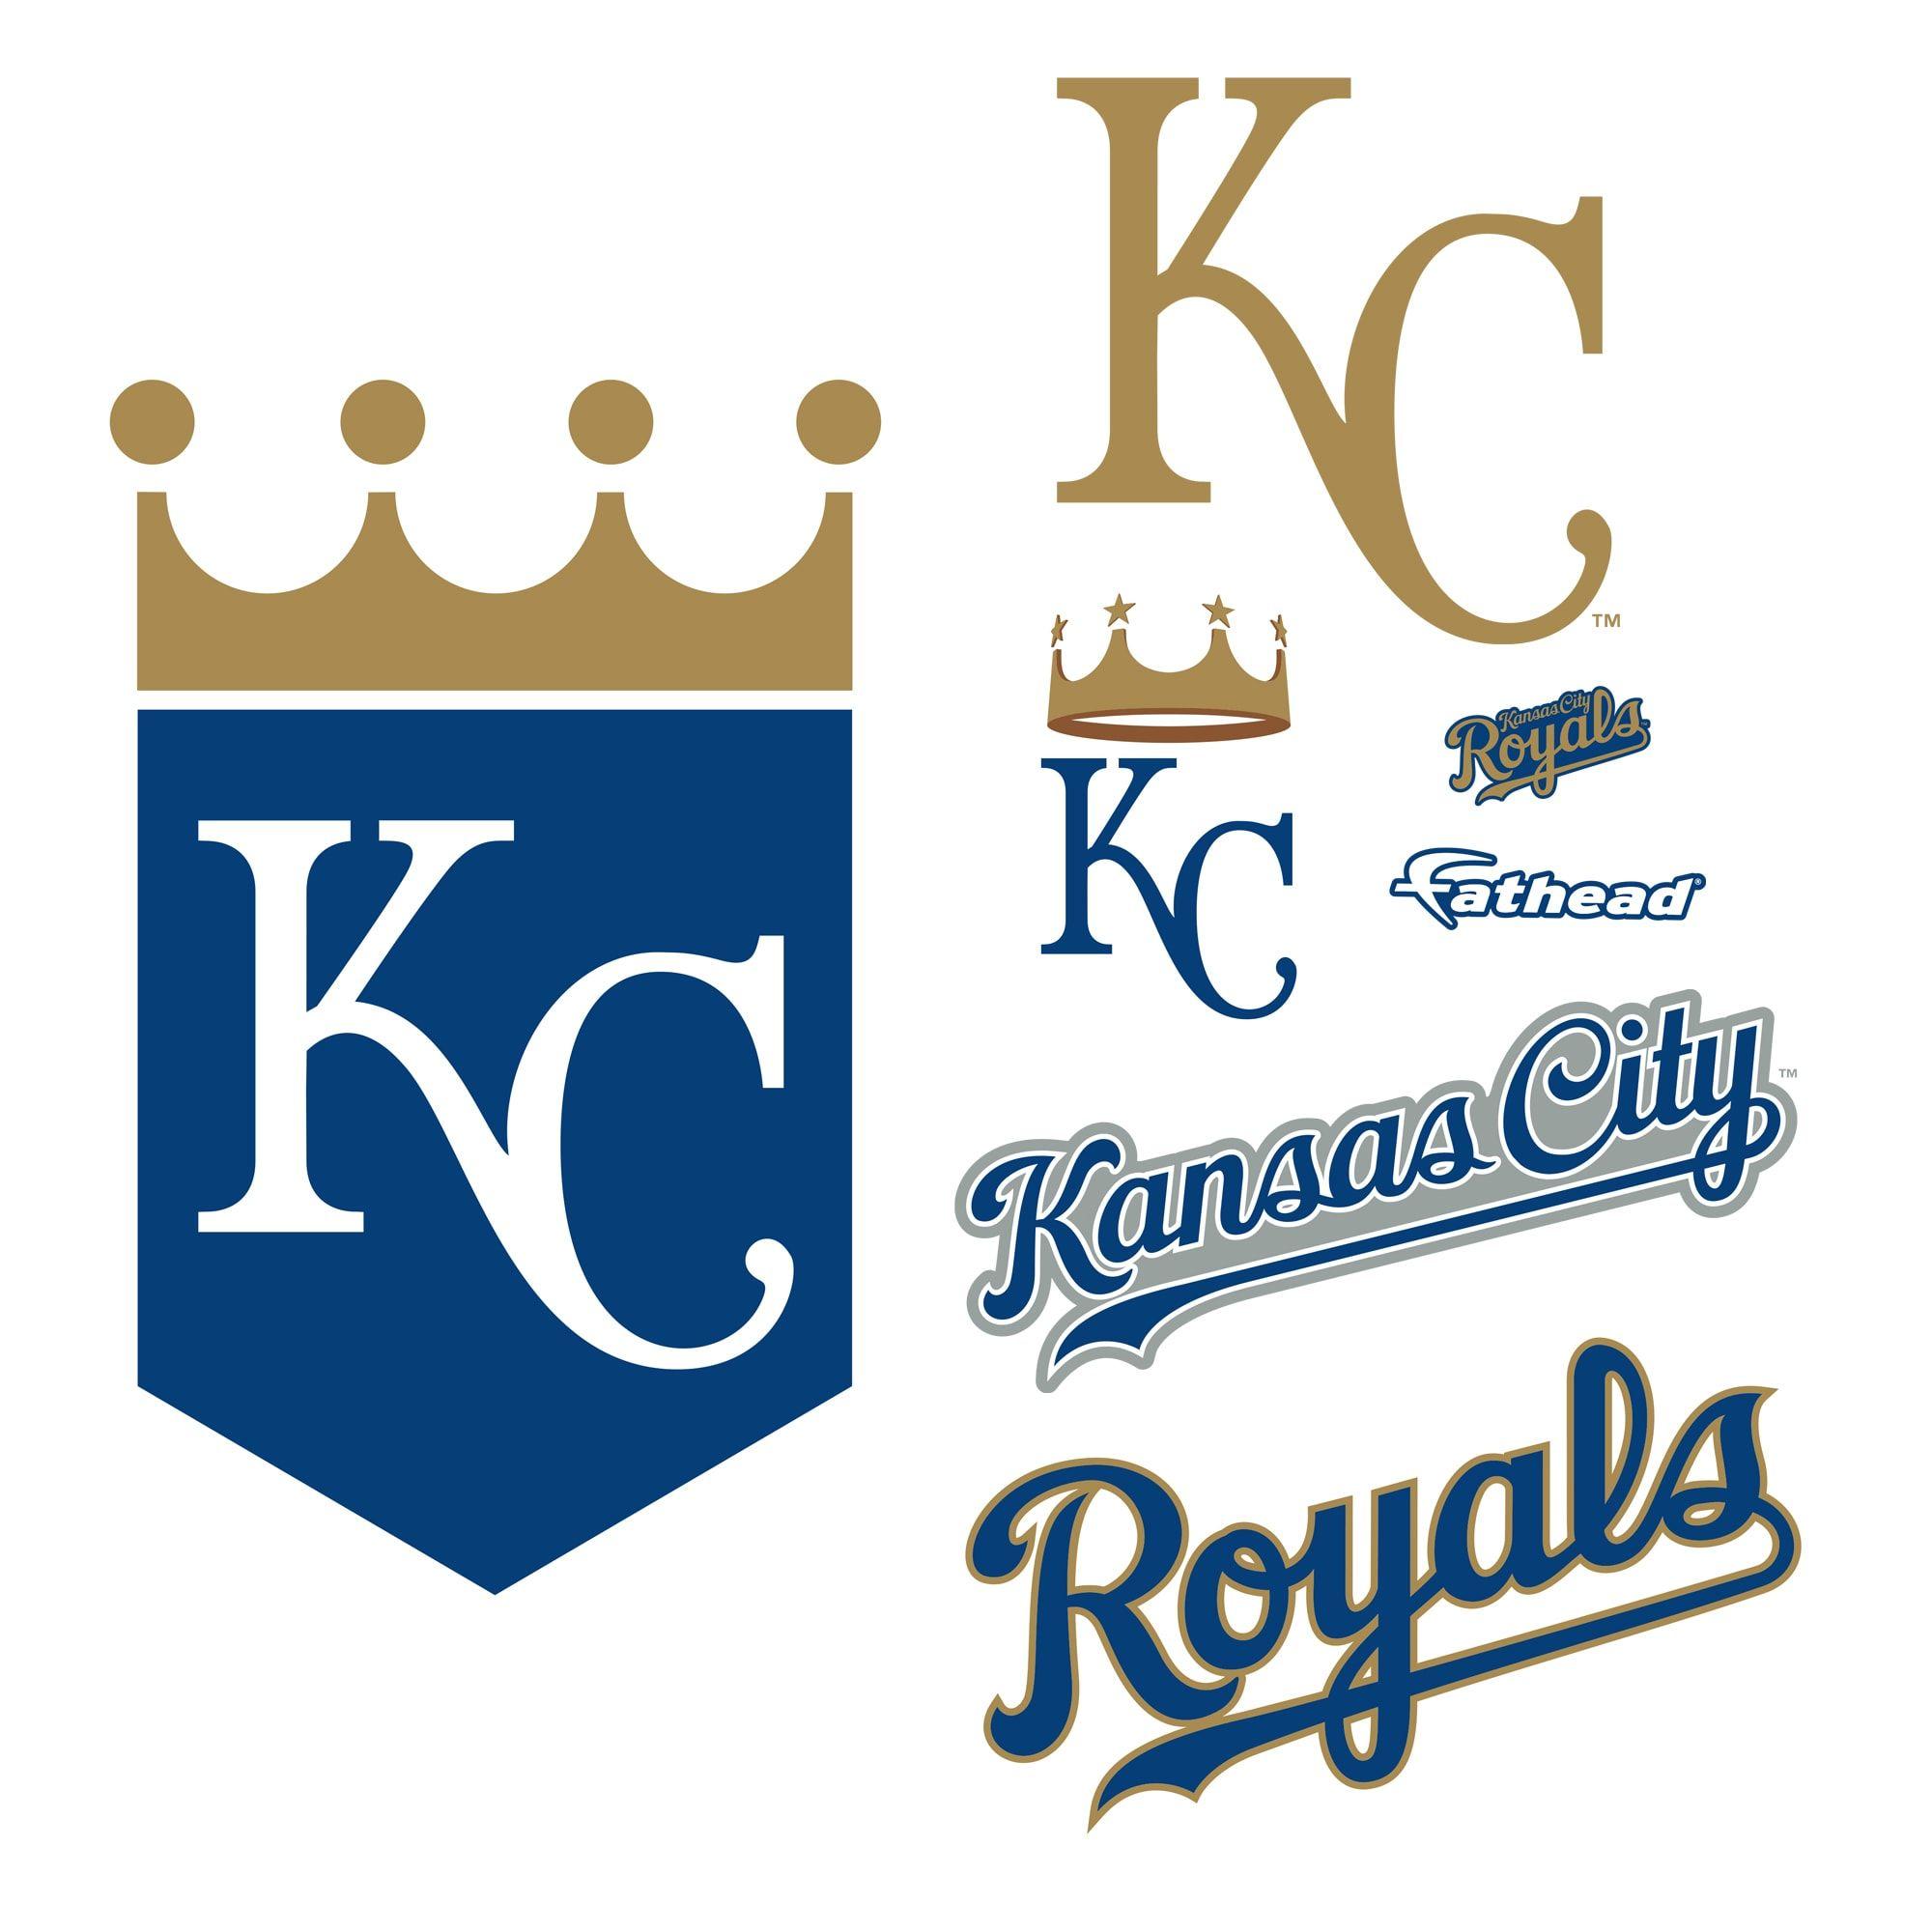 Kansas City Royals Logo Giant Officially Licensed Mlb Removable Wall Decal Kansas City Royals Logo Kansas City Royals Kansas City